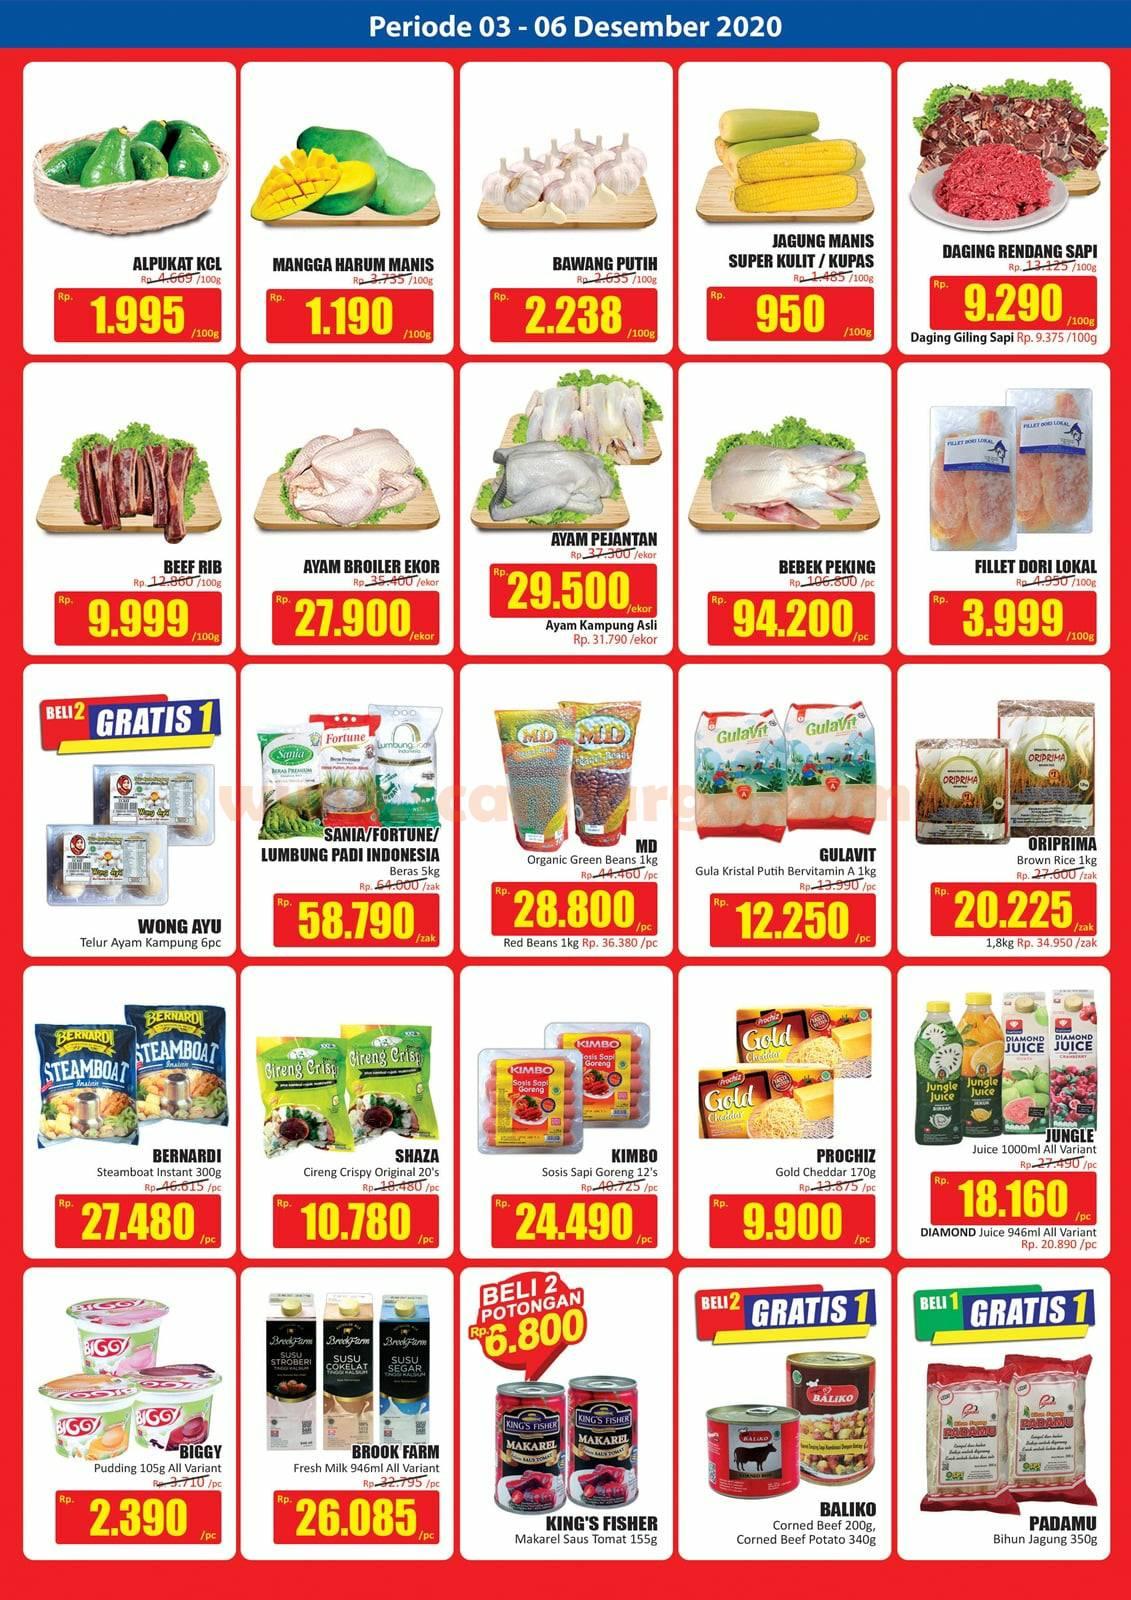 Katalog Promo JSM Hari Hari Swalayan Weekend 3 - 6 Desember 2020 2